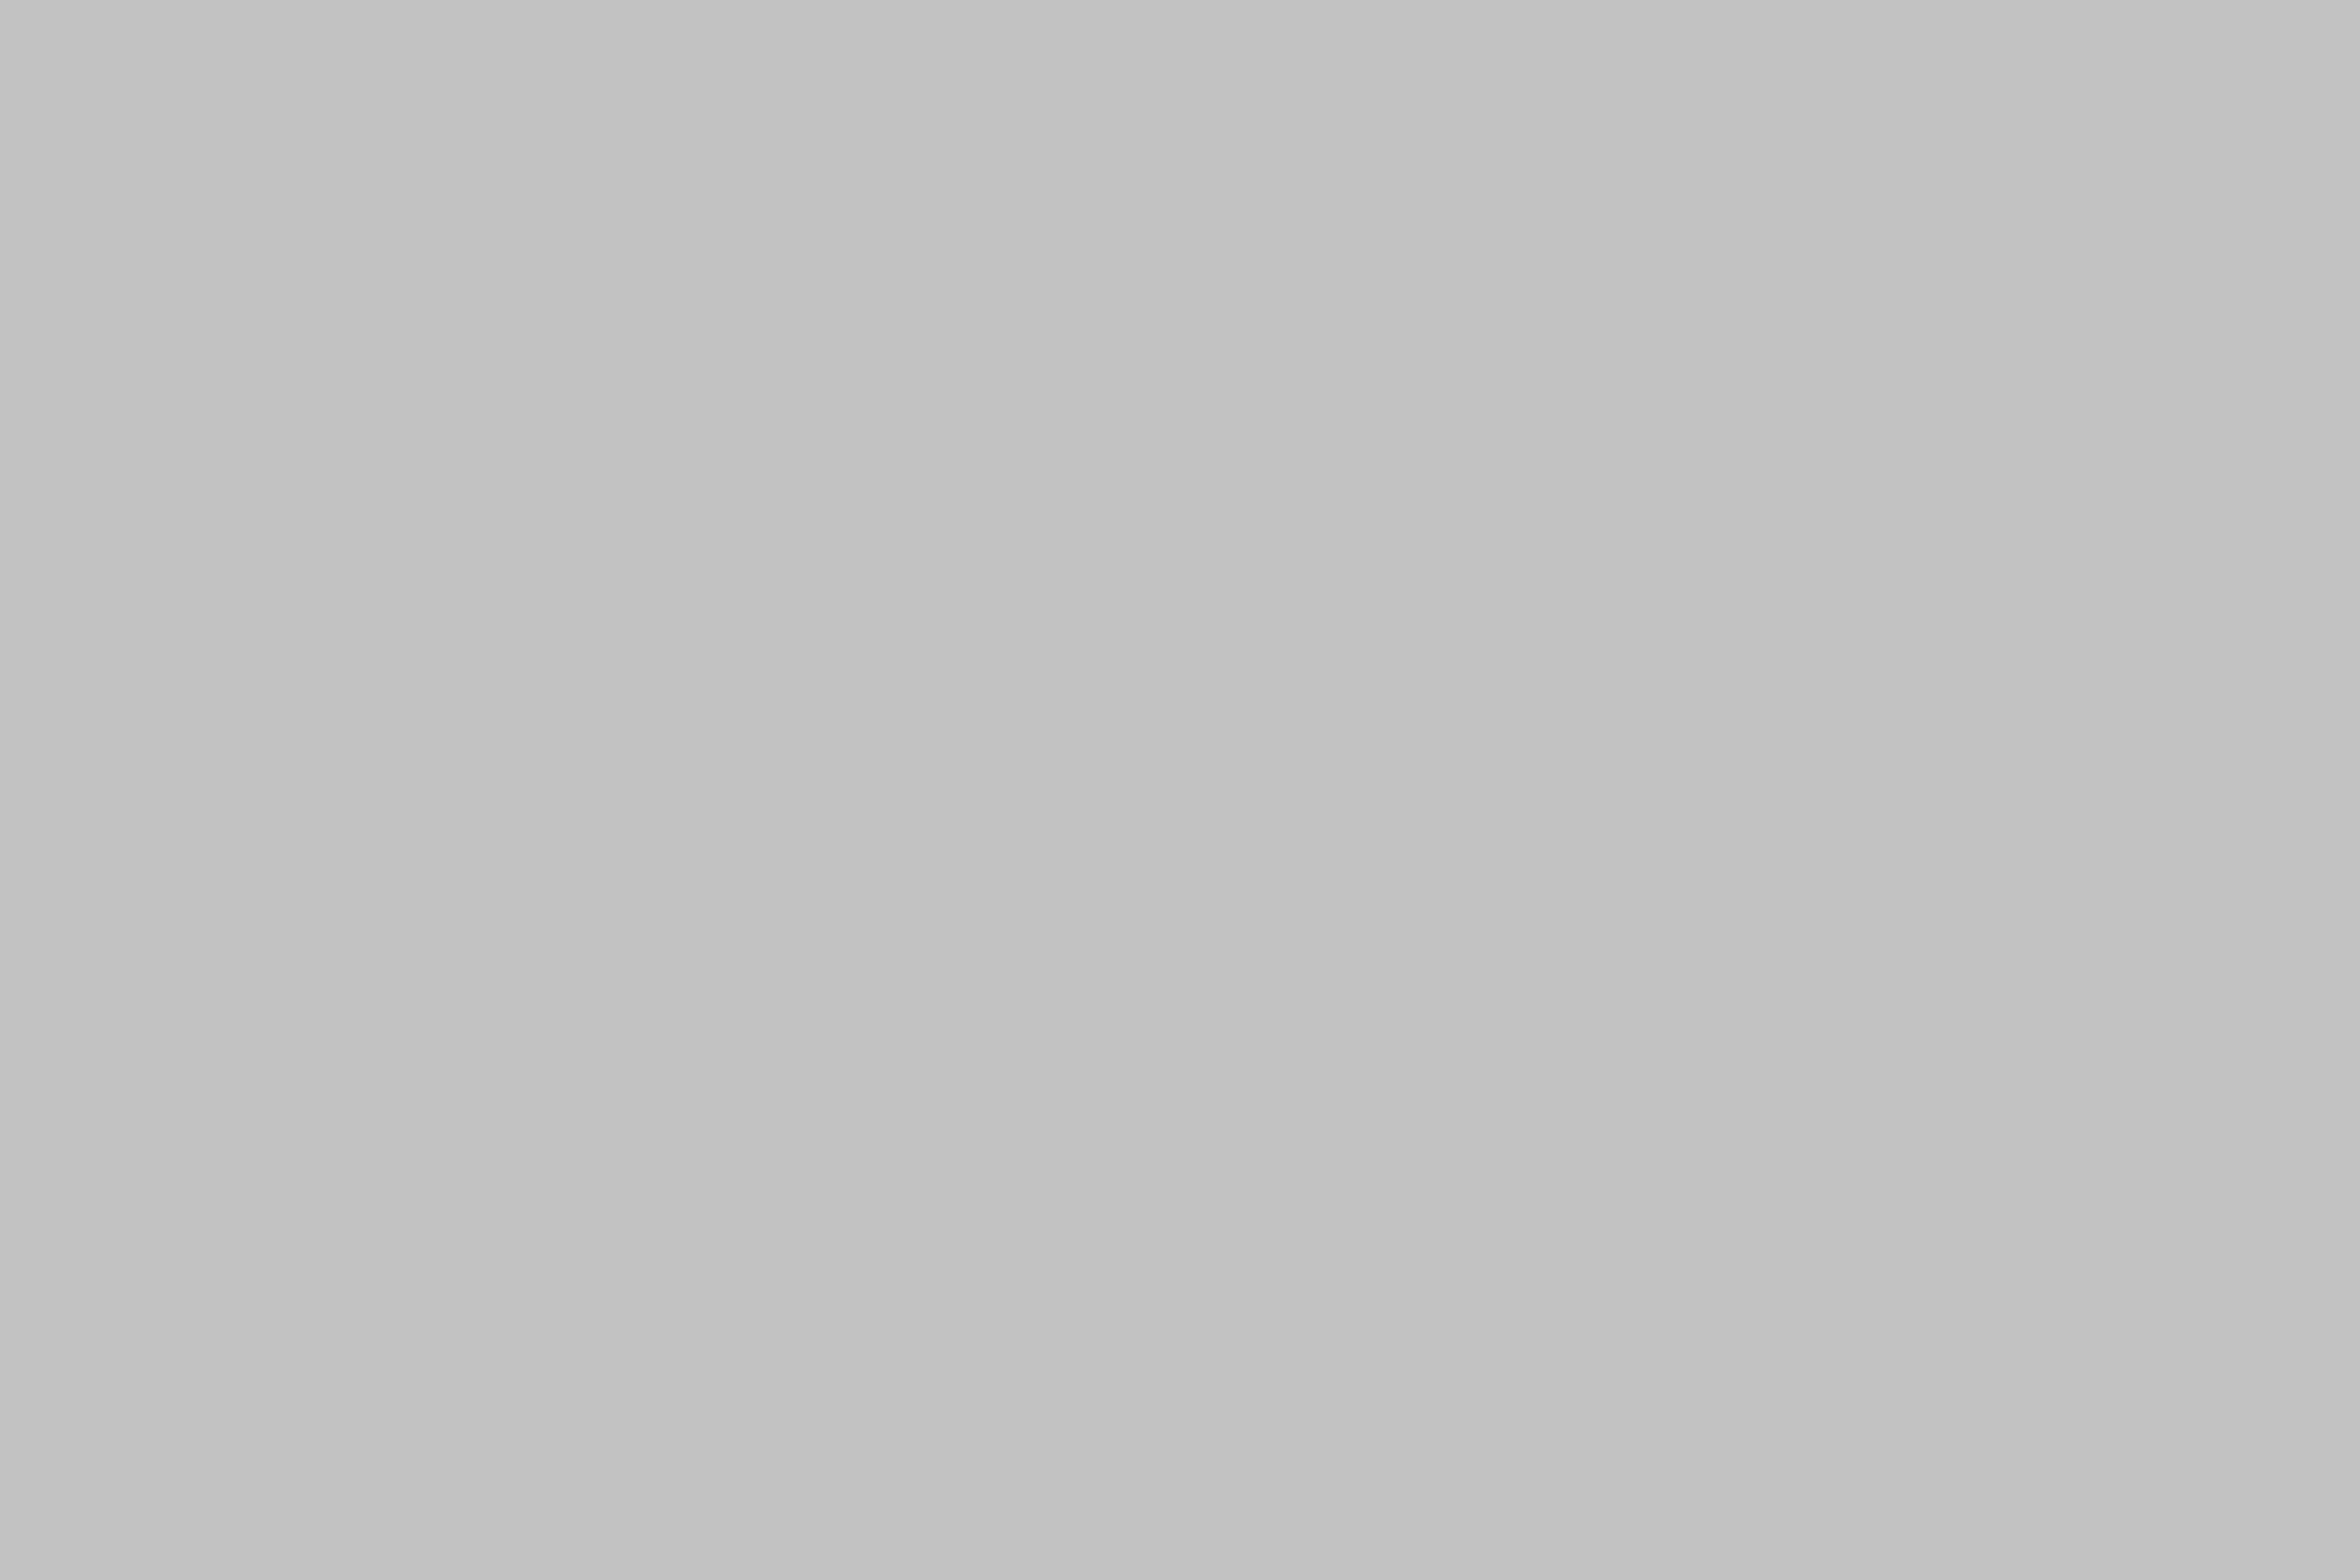 SquareSpace-SermonSeries copy 9.jpg